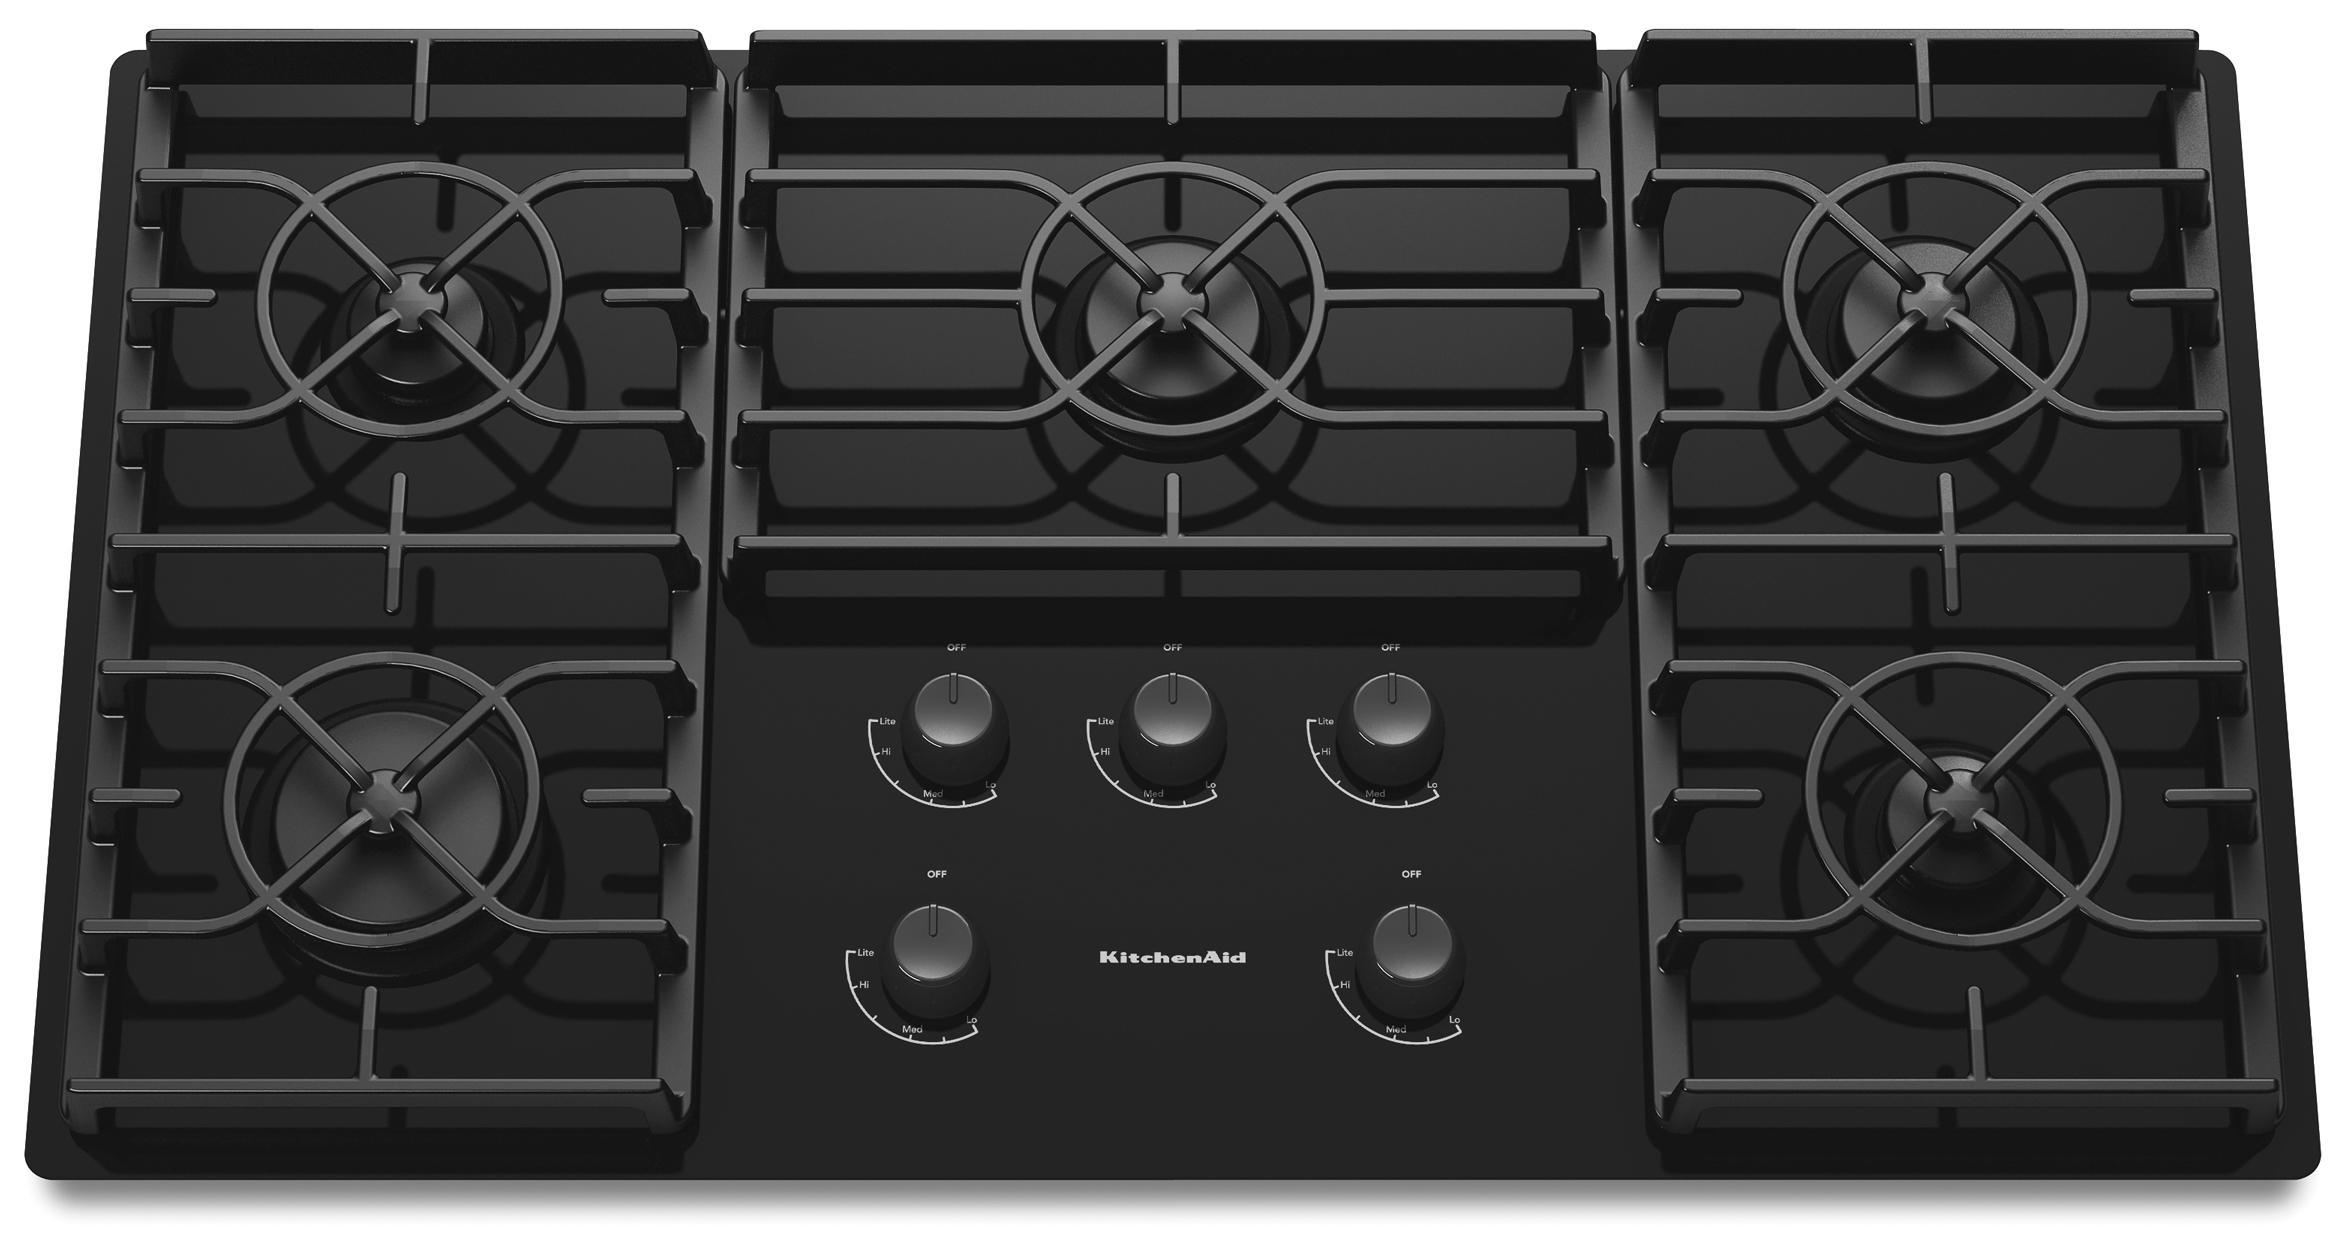 "KitchenAid Gas Cooktops 36"" Built-In Gas Cooktop - Item Number: KGCC566RBL"